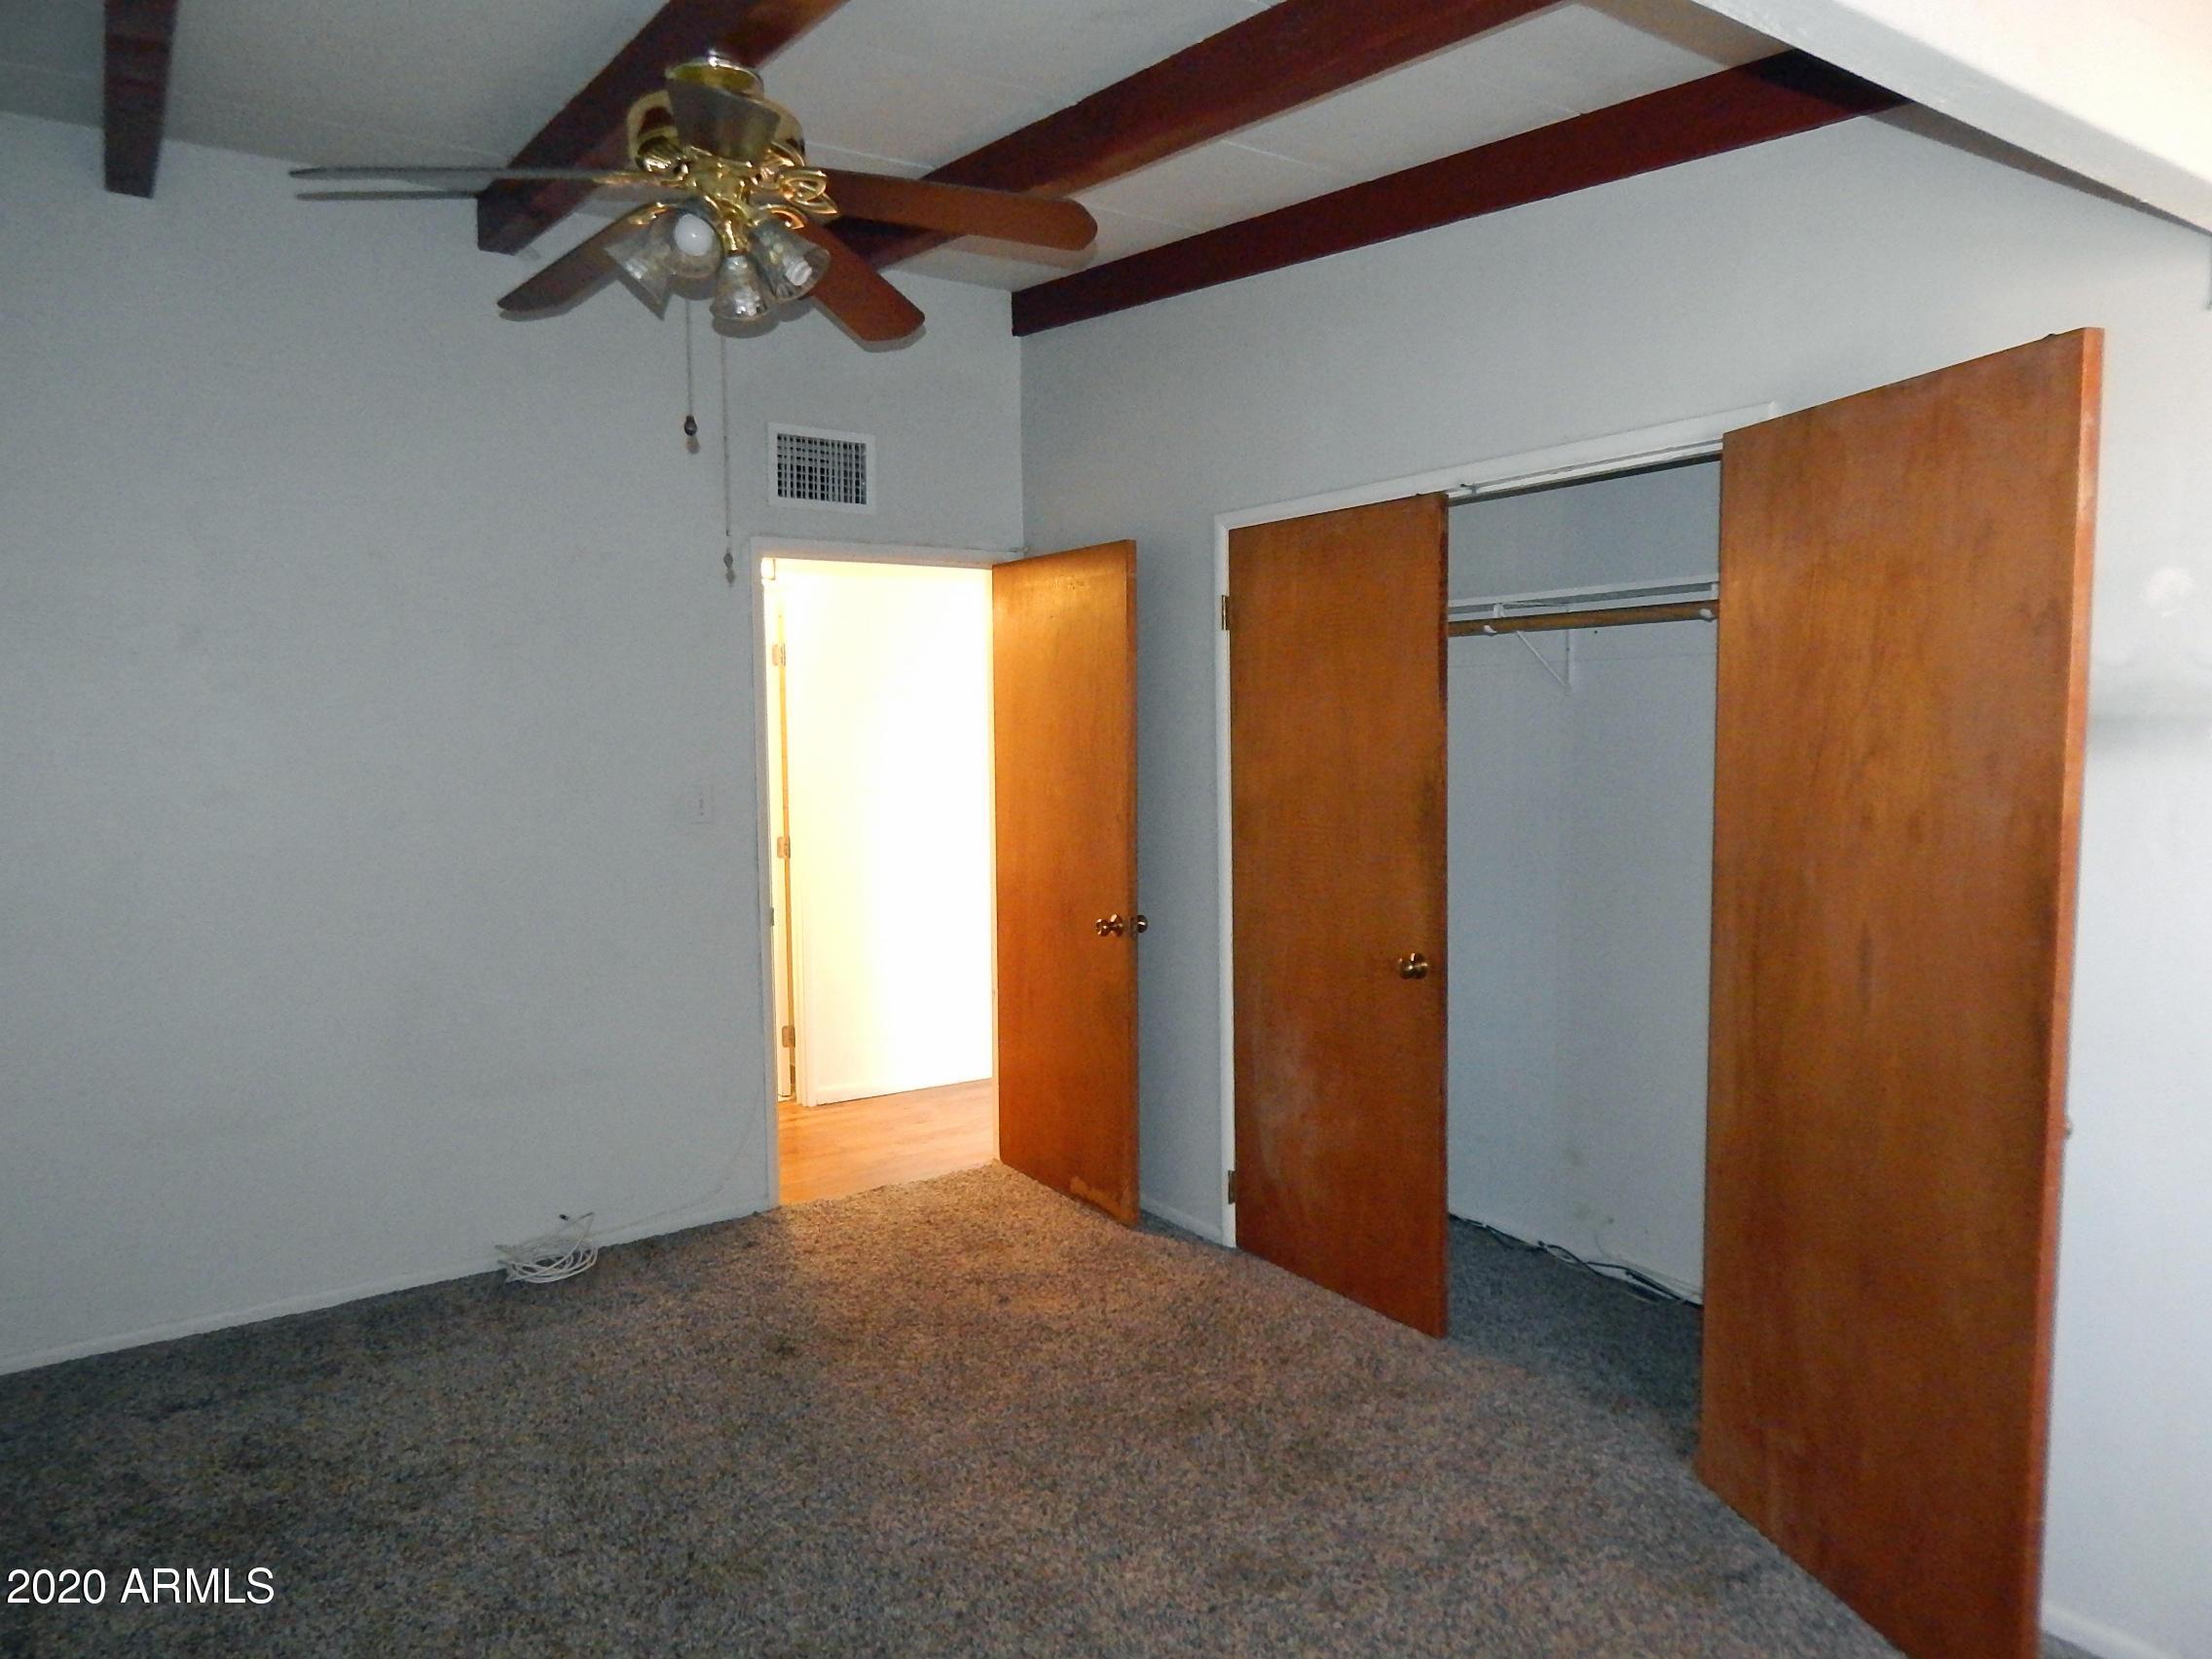 104 NAVAJO Drive, Bisbee, Arizona 85603, 2 Bedrooms Bedrooms, ,3 BathroomsBathrooms,Single Family,For Sale,104 NAVAJO Drive,1,6171712